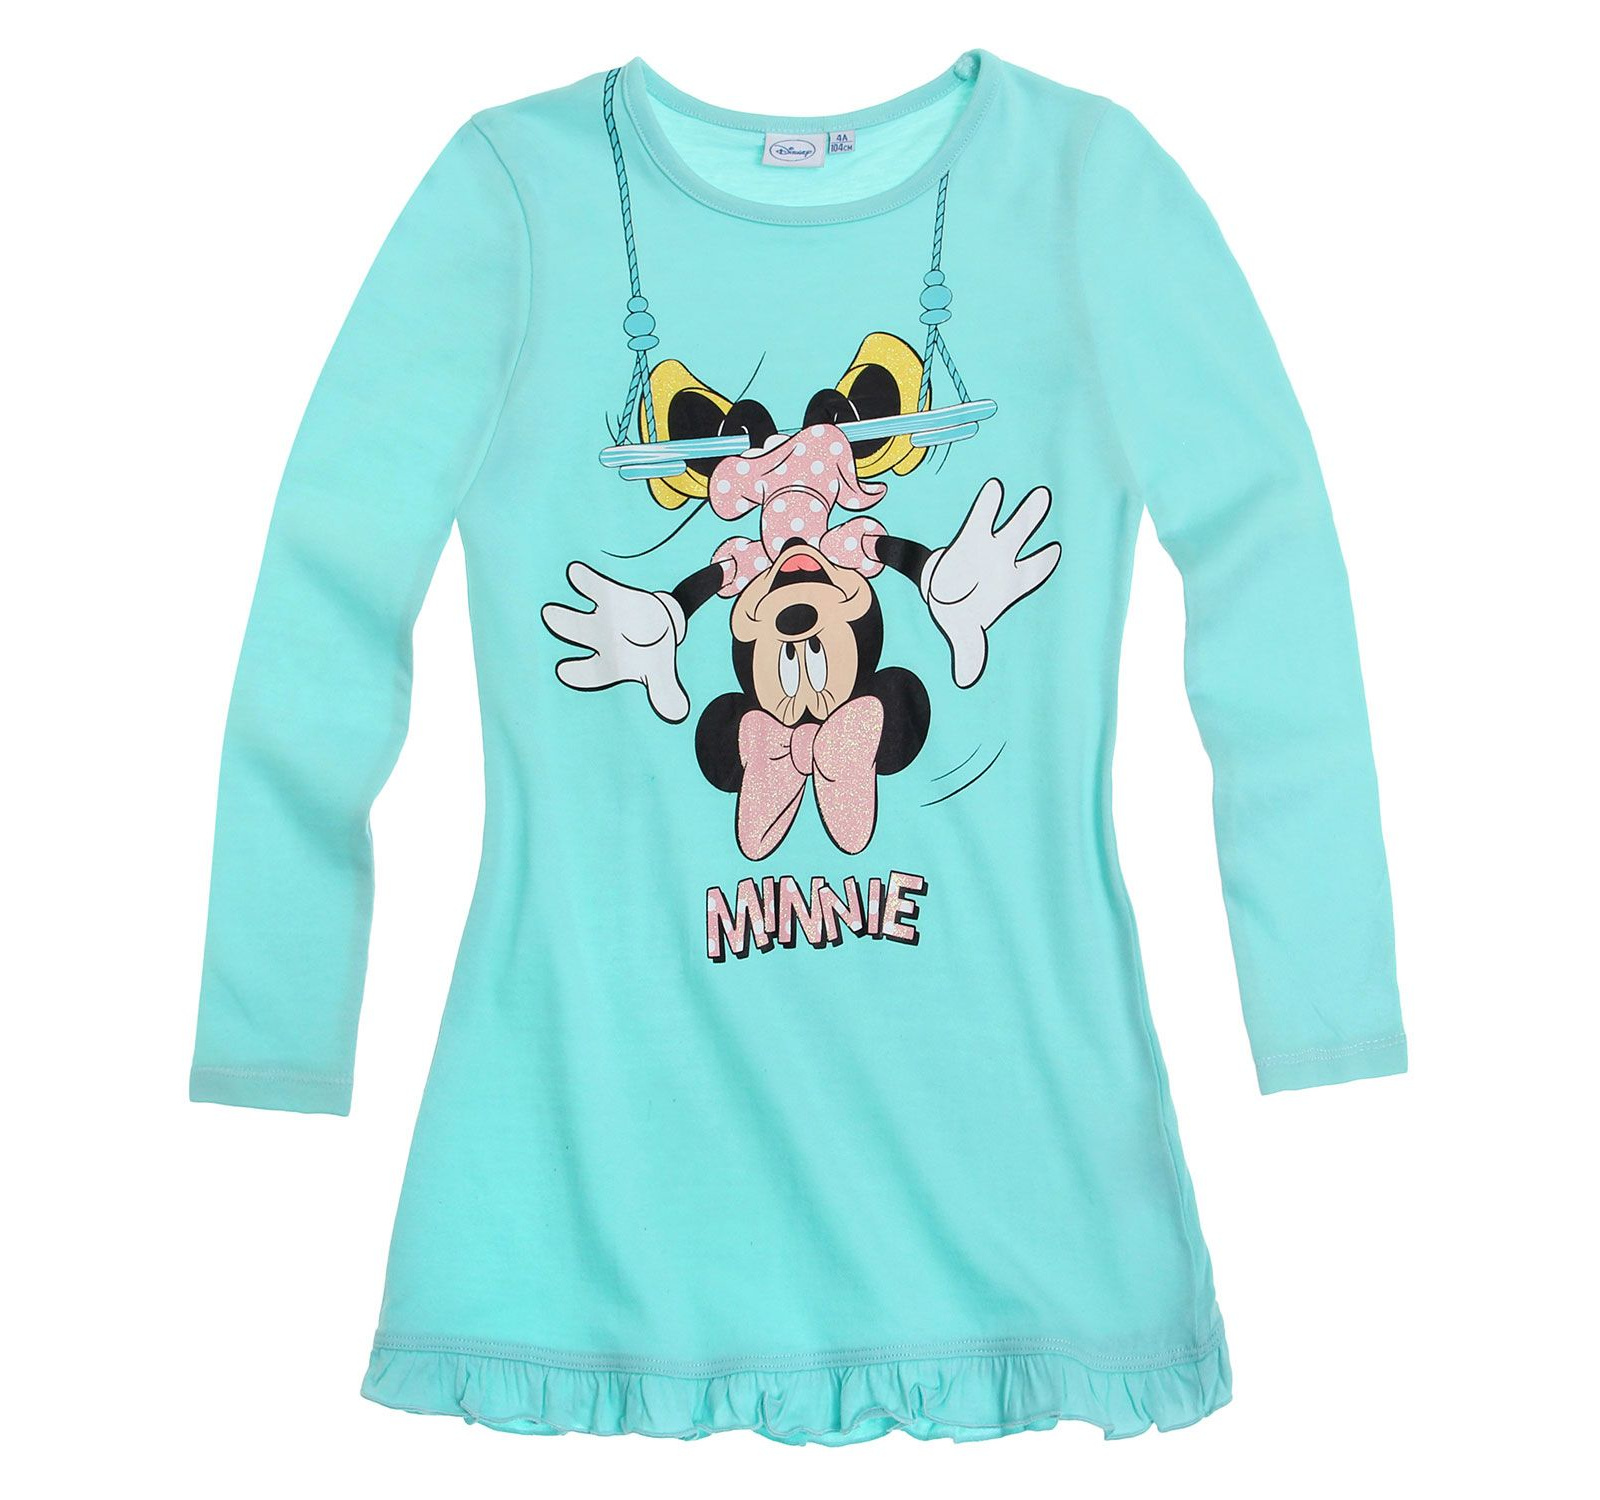 Minnie® Camasa noapte (92-128) Turcoaz